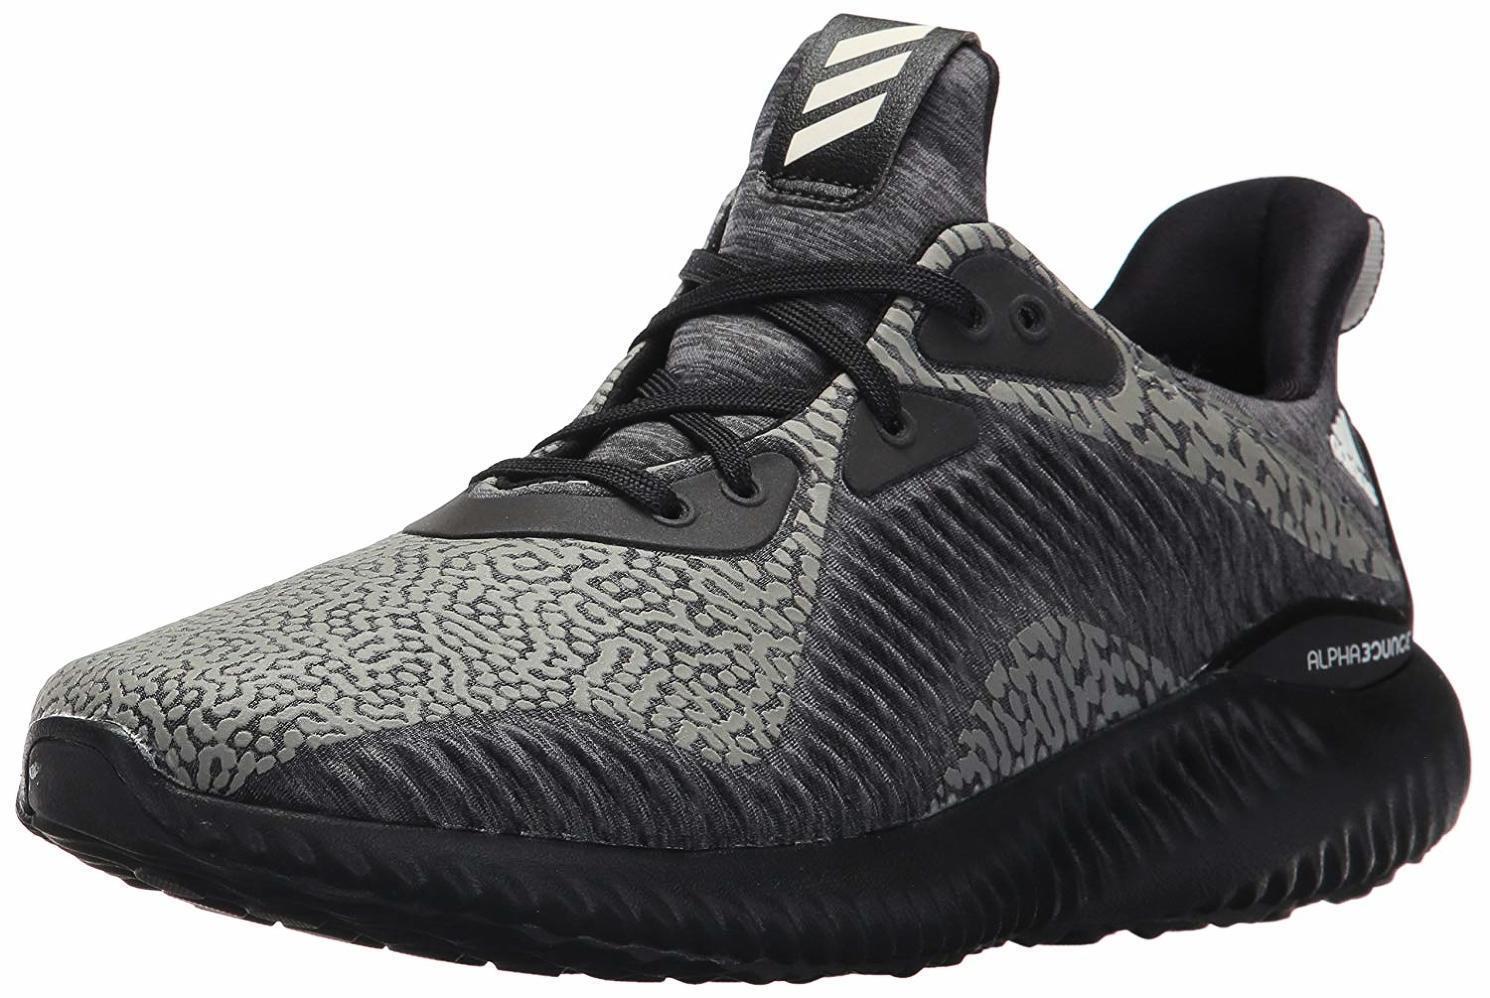 Adidas Women's Alphabounce HPC AMS w Running shoes - Choose SZ color